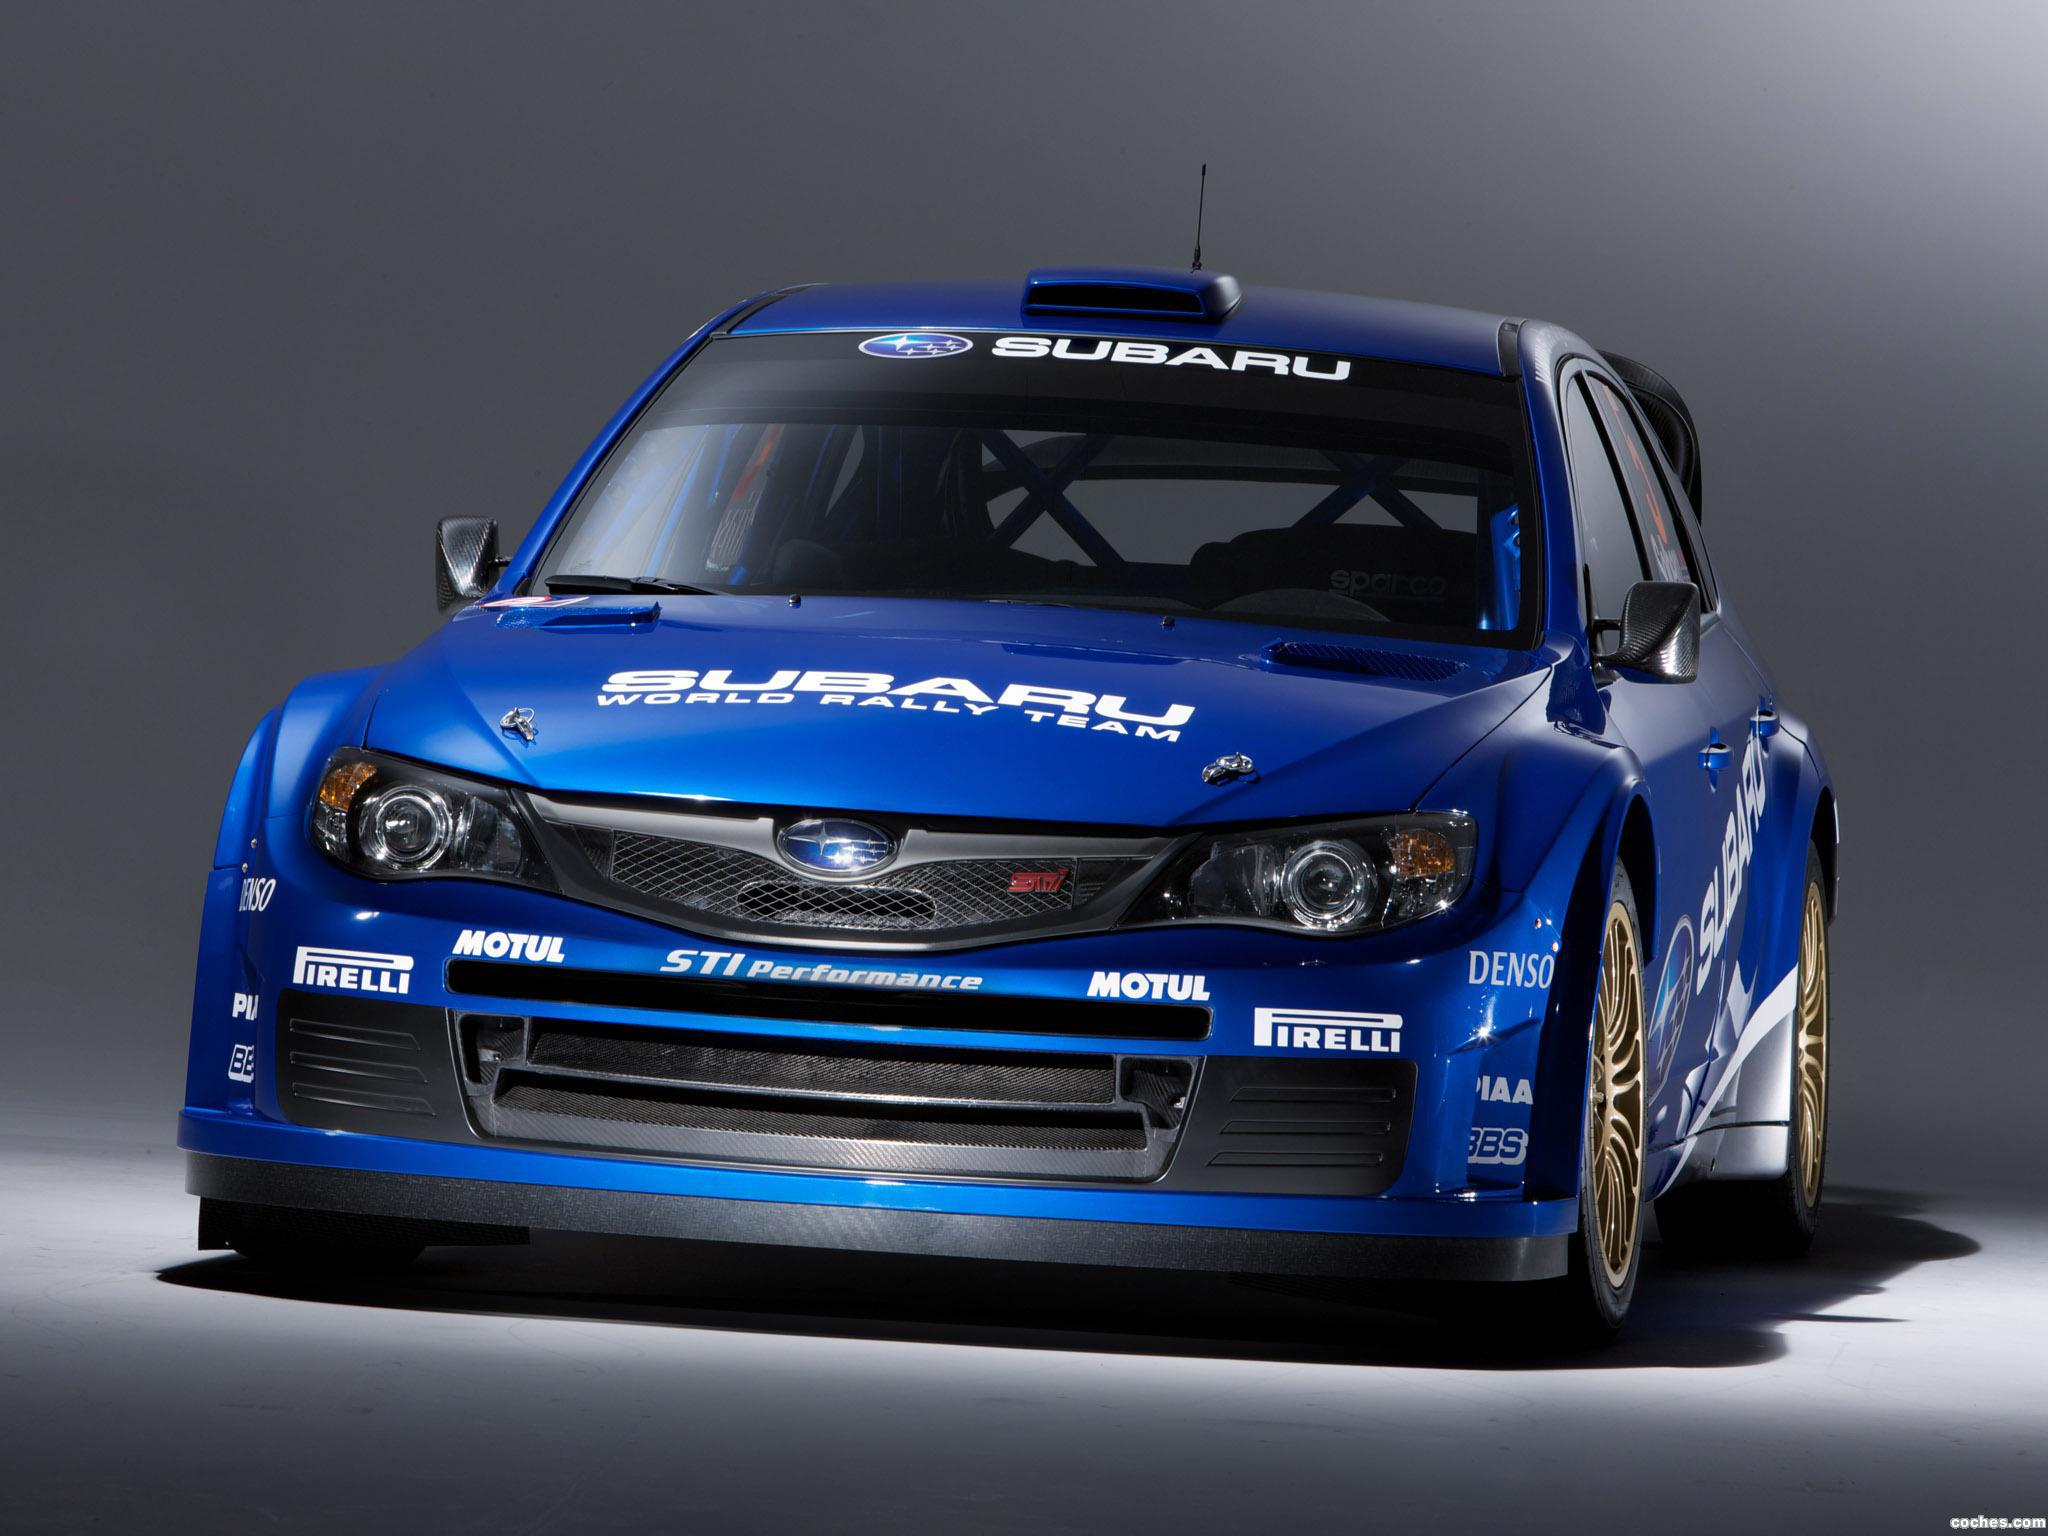 Foto 1 de Subaru Impreza WRC 2008